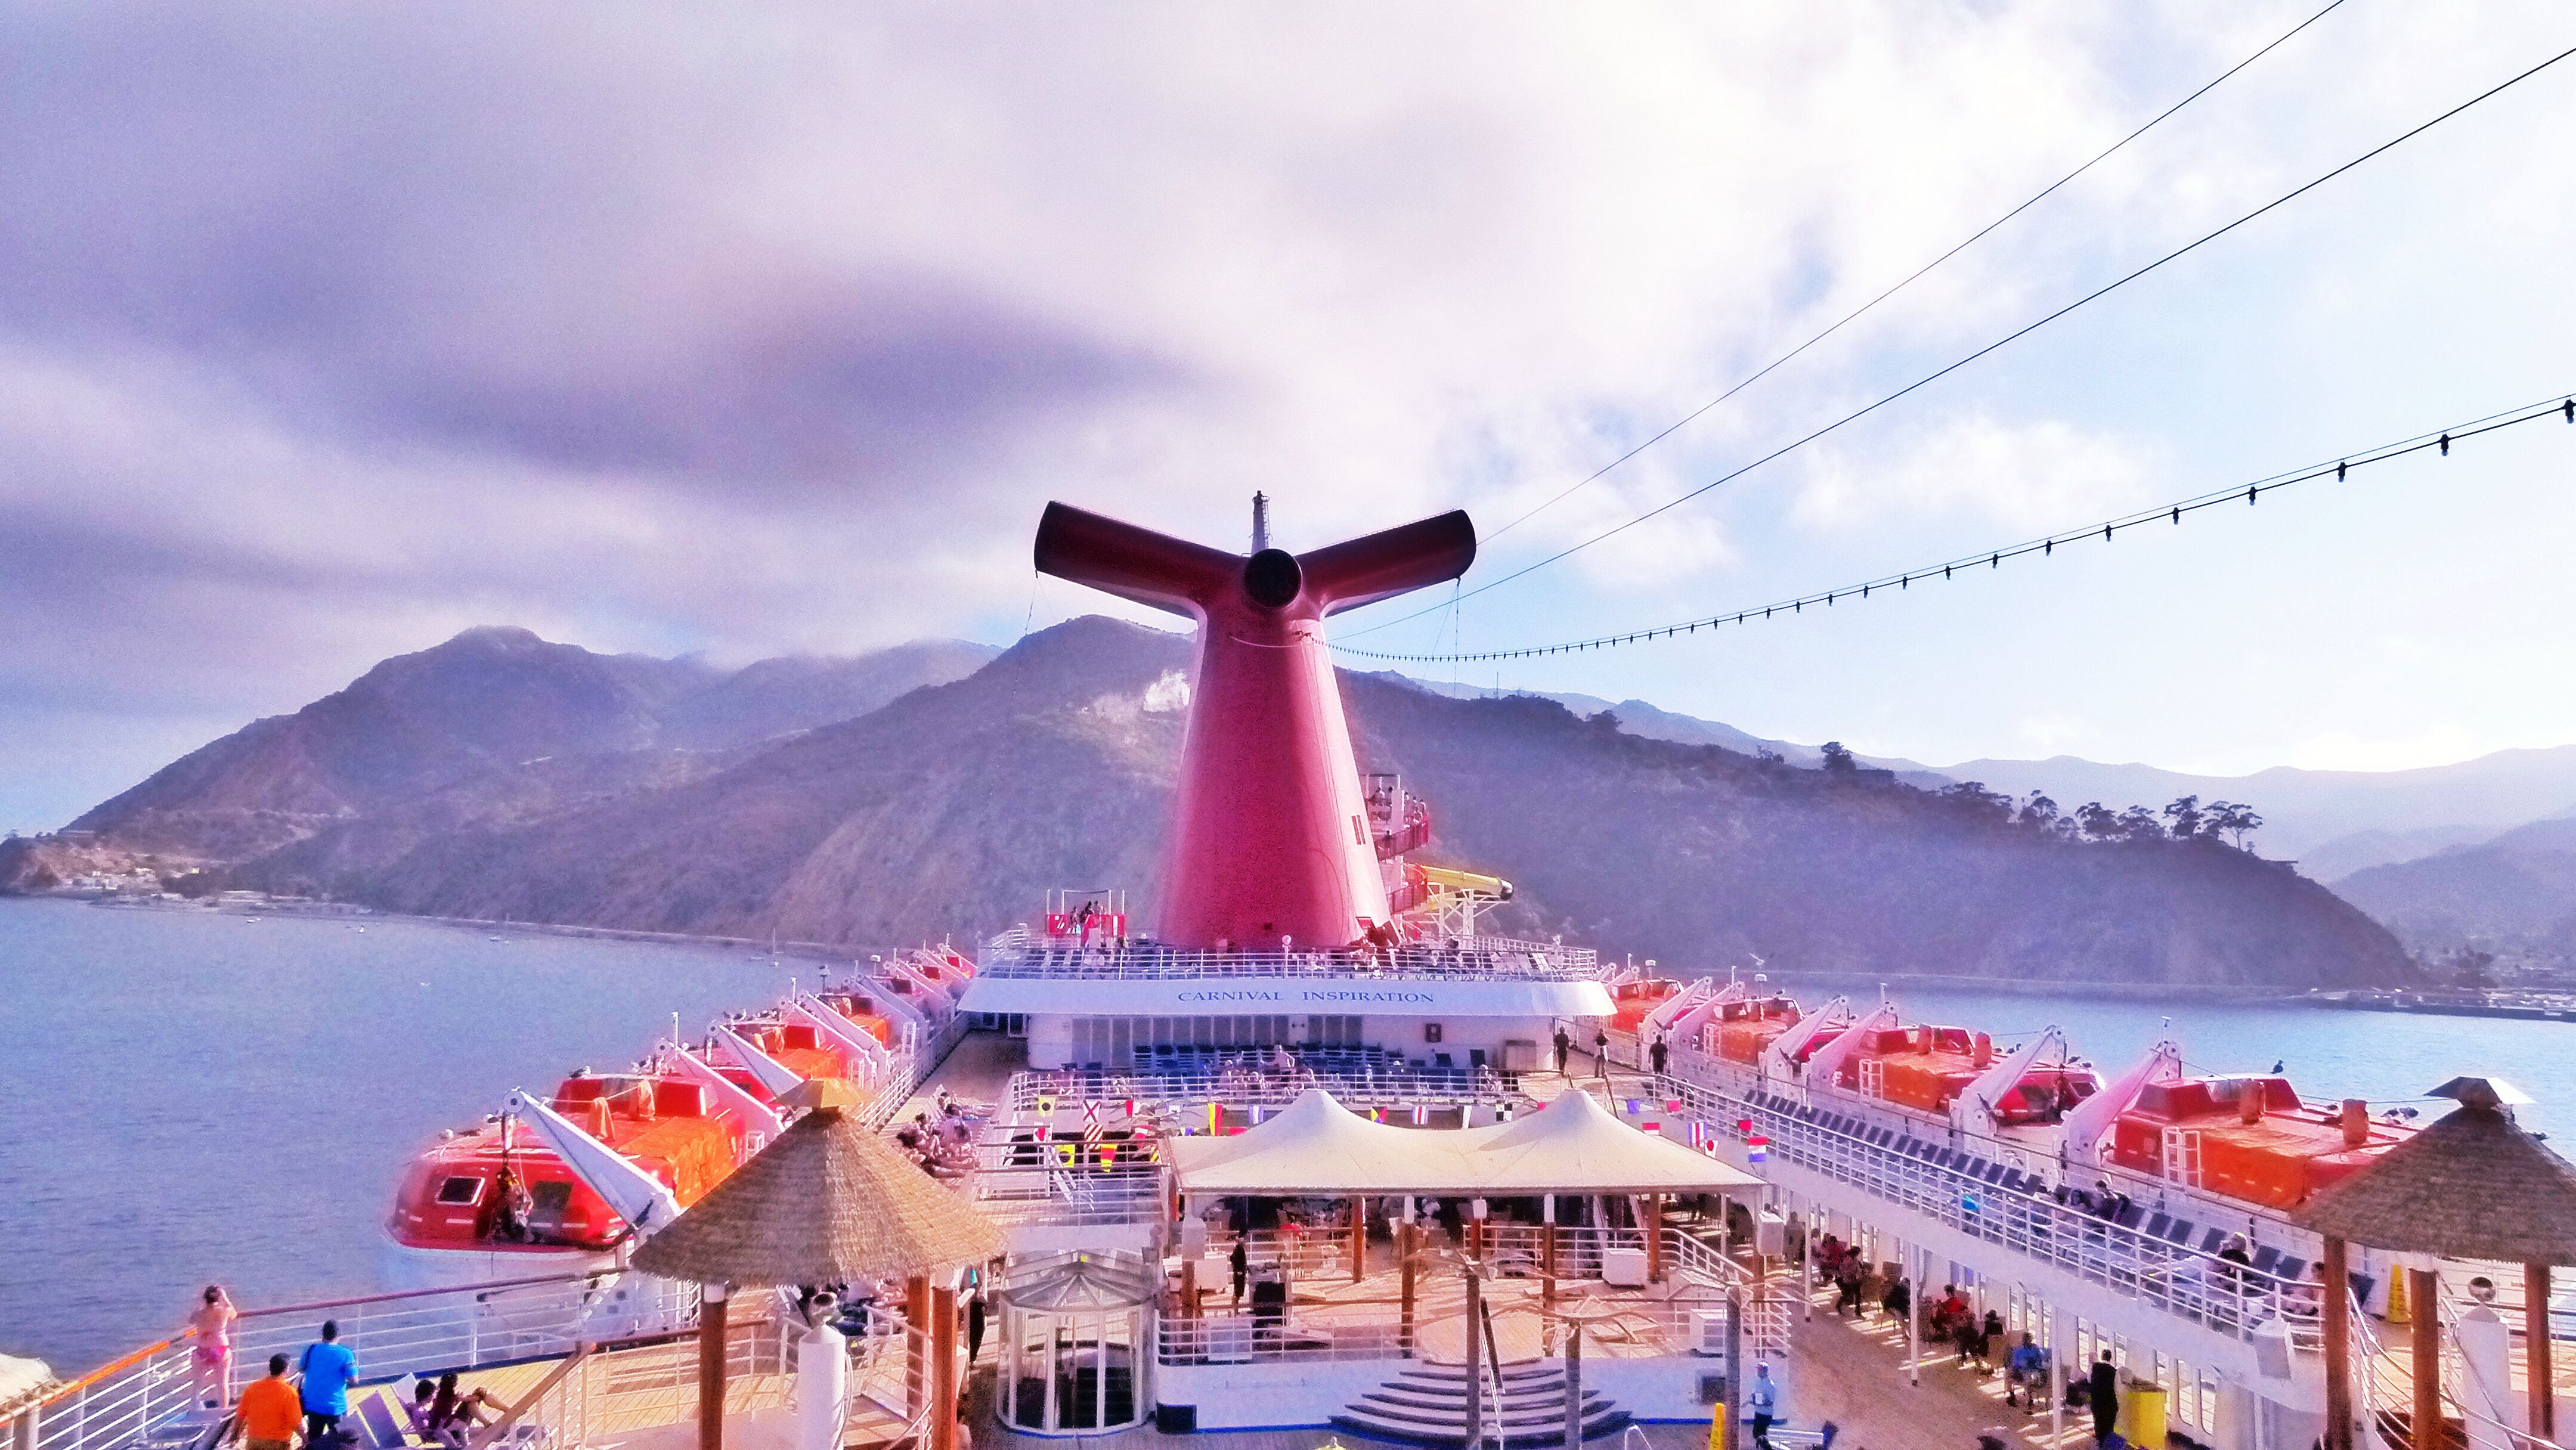 Good Bye To Catalina Island And Heading To Ensenada Mexico On The - Catalina cruises